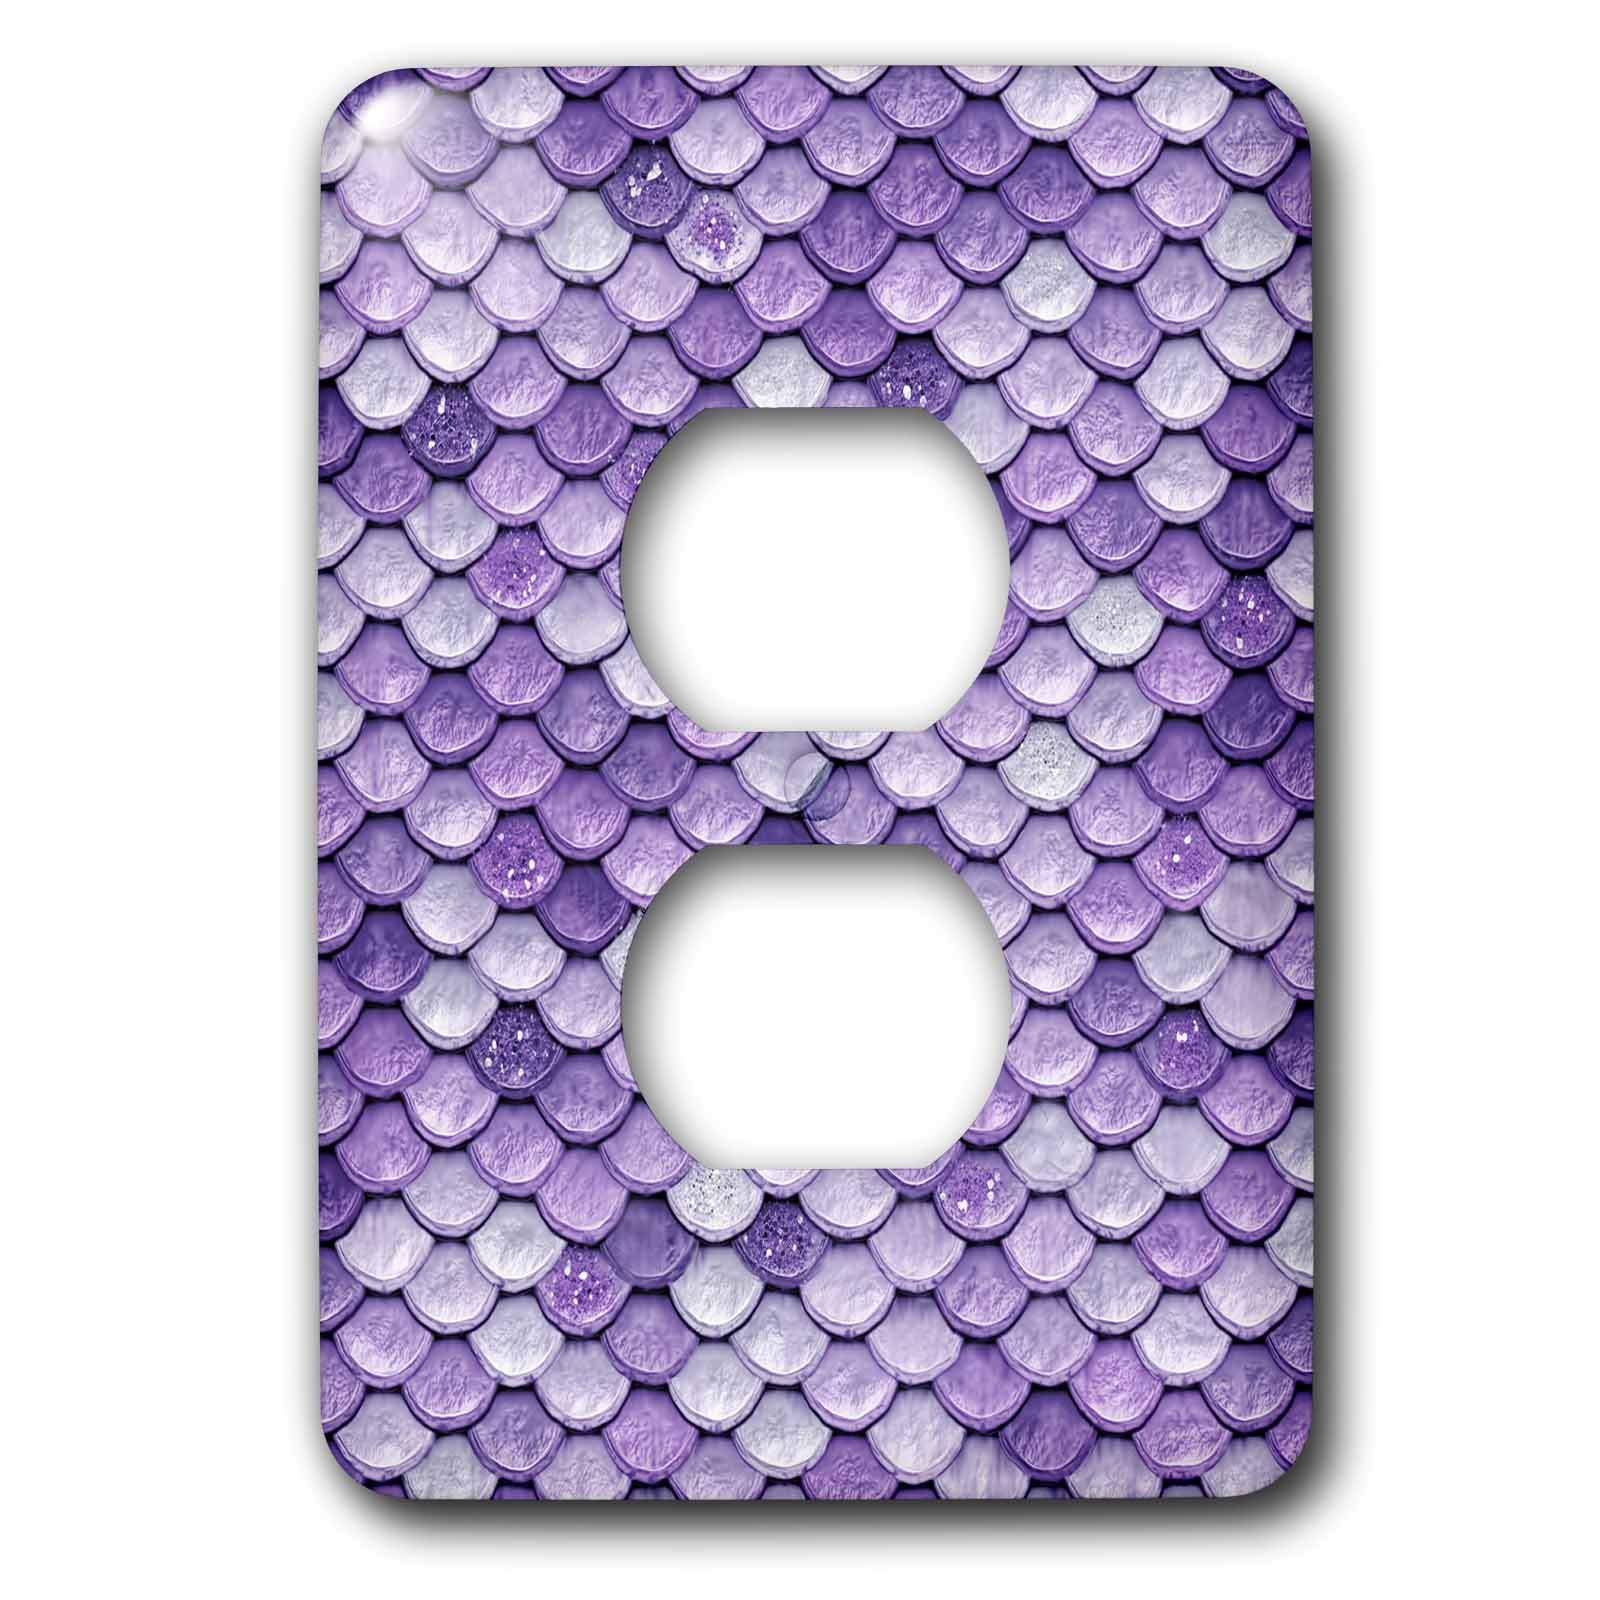 3dRose (lsp_266922_6) 2 Plug Outlet Cover (6) 2 Sparkling Luxury Elegant Purple Mermaid Scales Glitter Effect Art Print